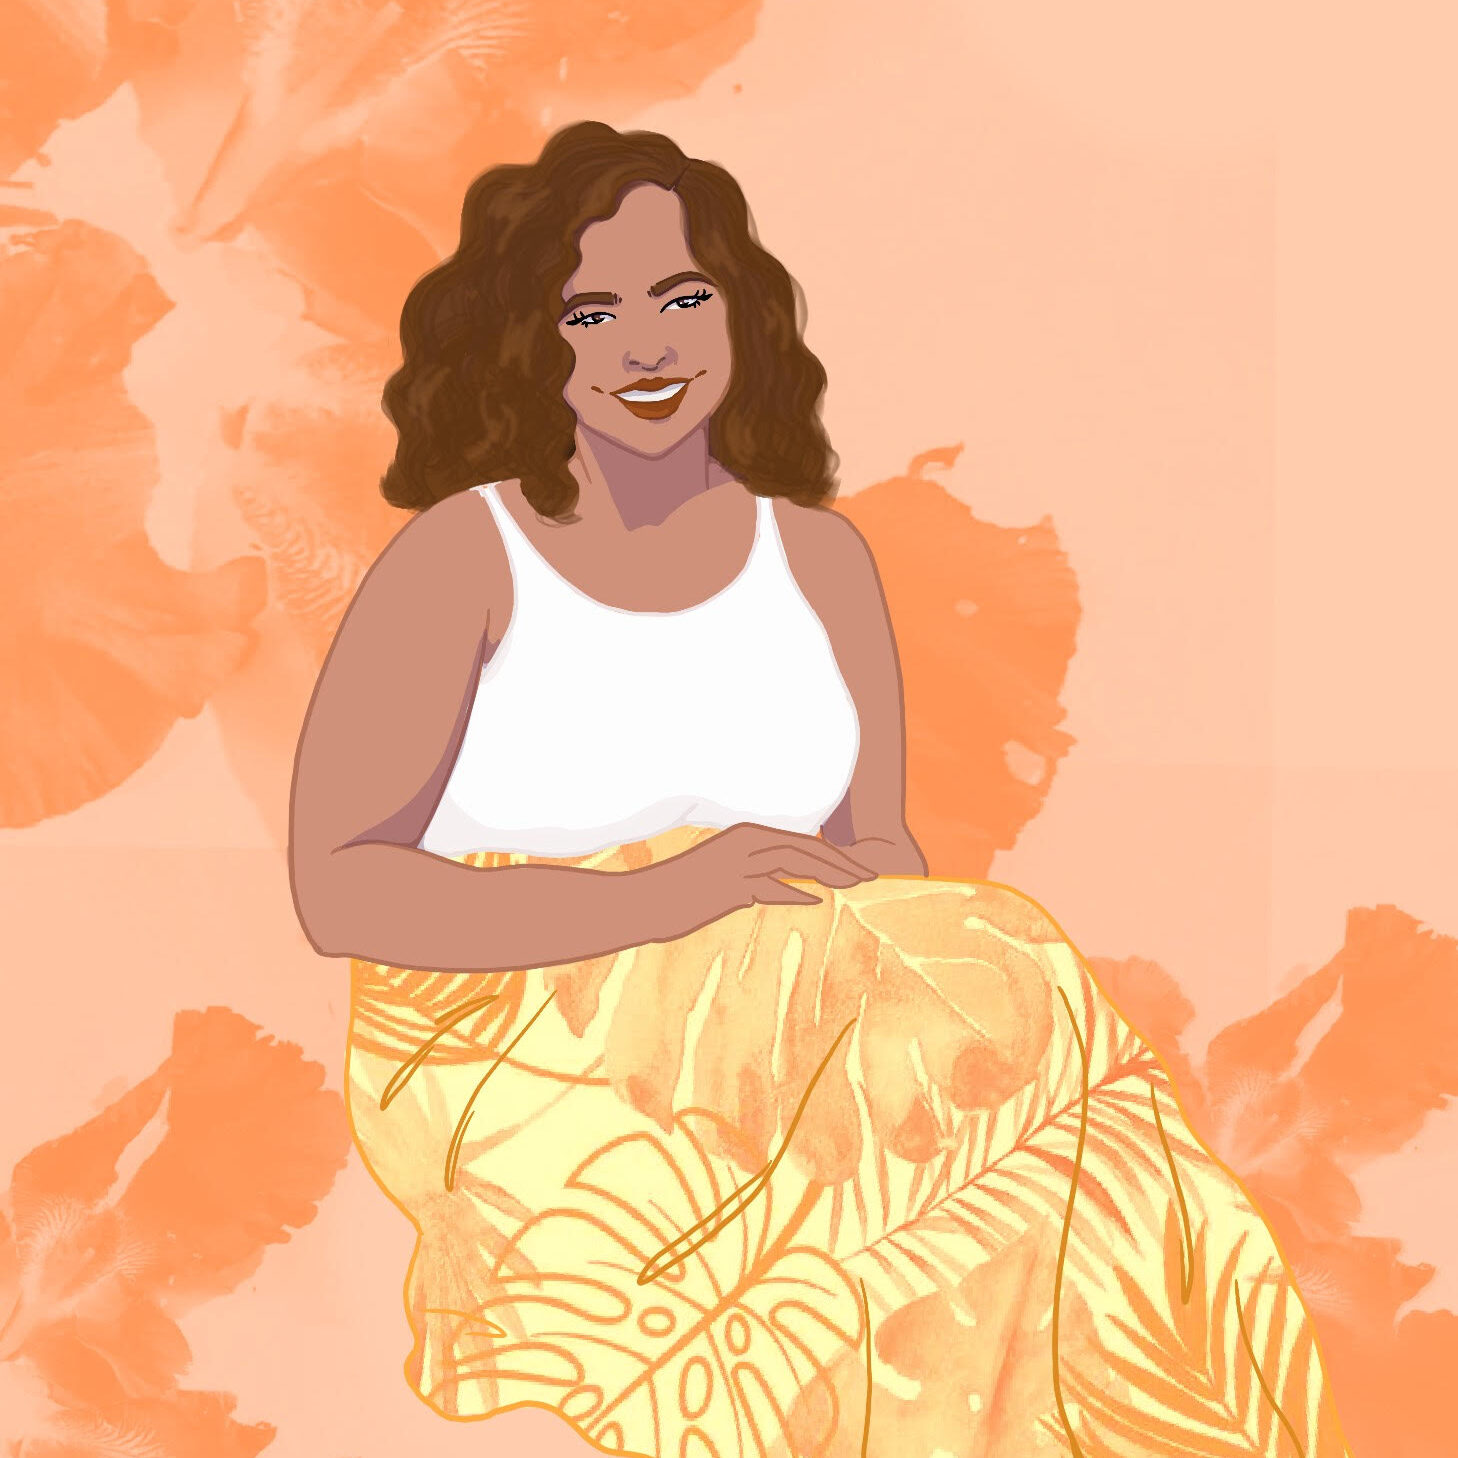 Illustration by Toria Talanoa